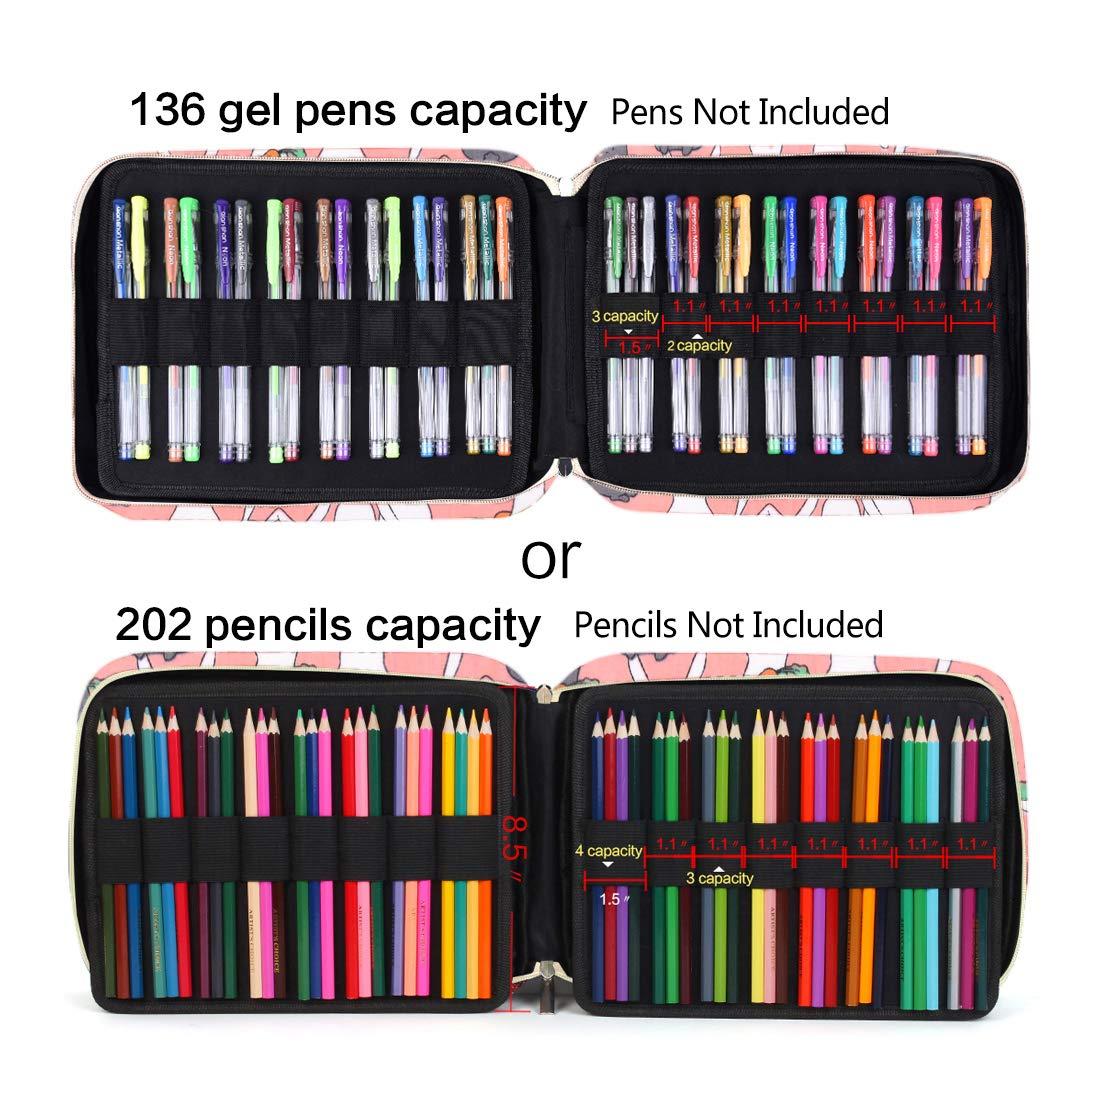 202 Colored Pencils Pencil Case 136 Color Gel Pens Pen Bag or Marker Organizer Universal Artist Use Supply Zippered Large Capacity Slot Super Big Professional Storage Forest-Friends